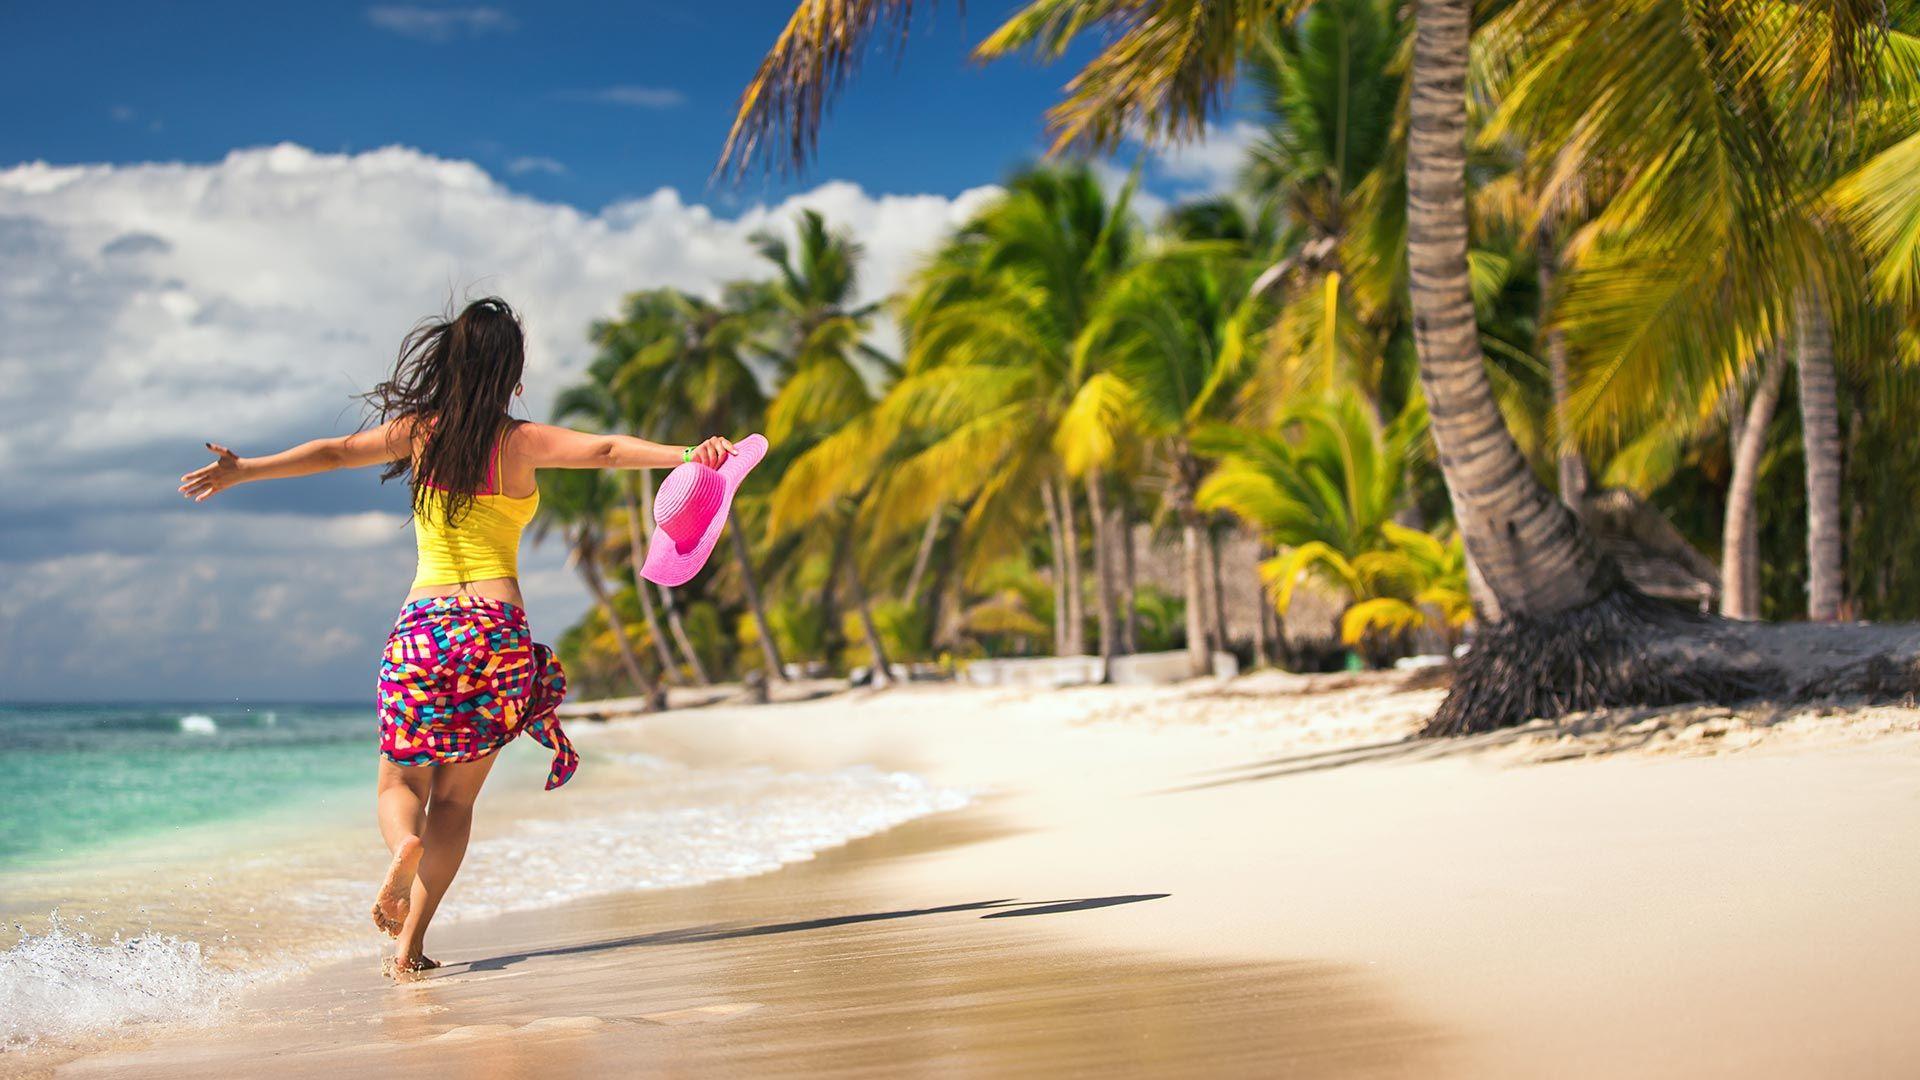 Last Minute - Sejur plaja Punta Cana, Republica Dominicana, 9 zile - 16 iulie 2021